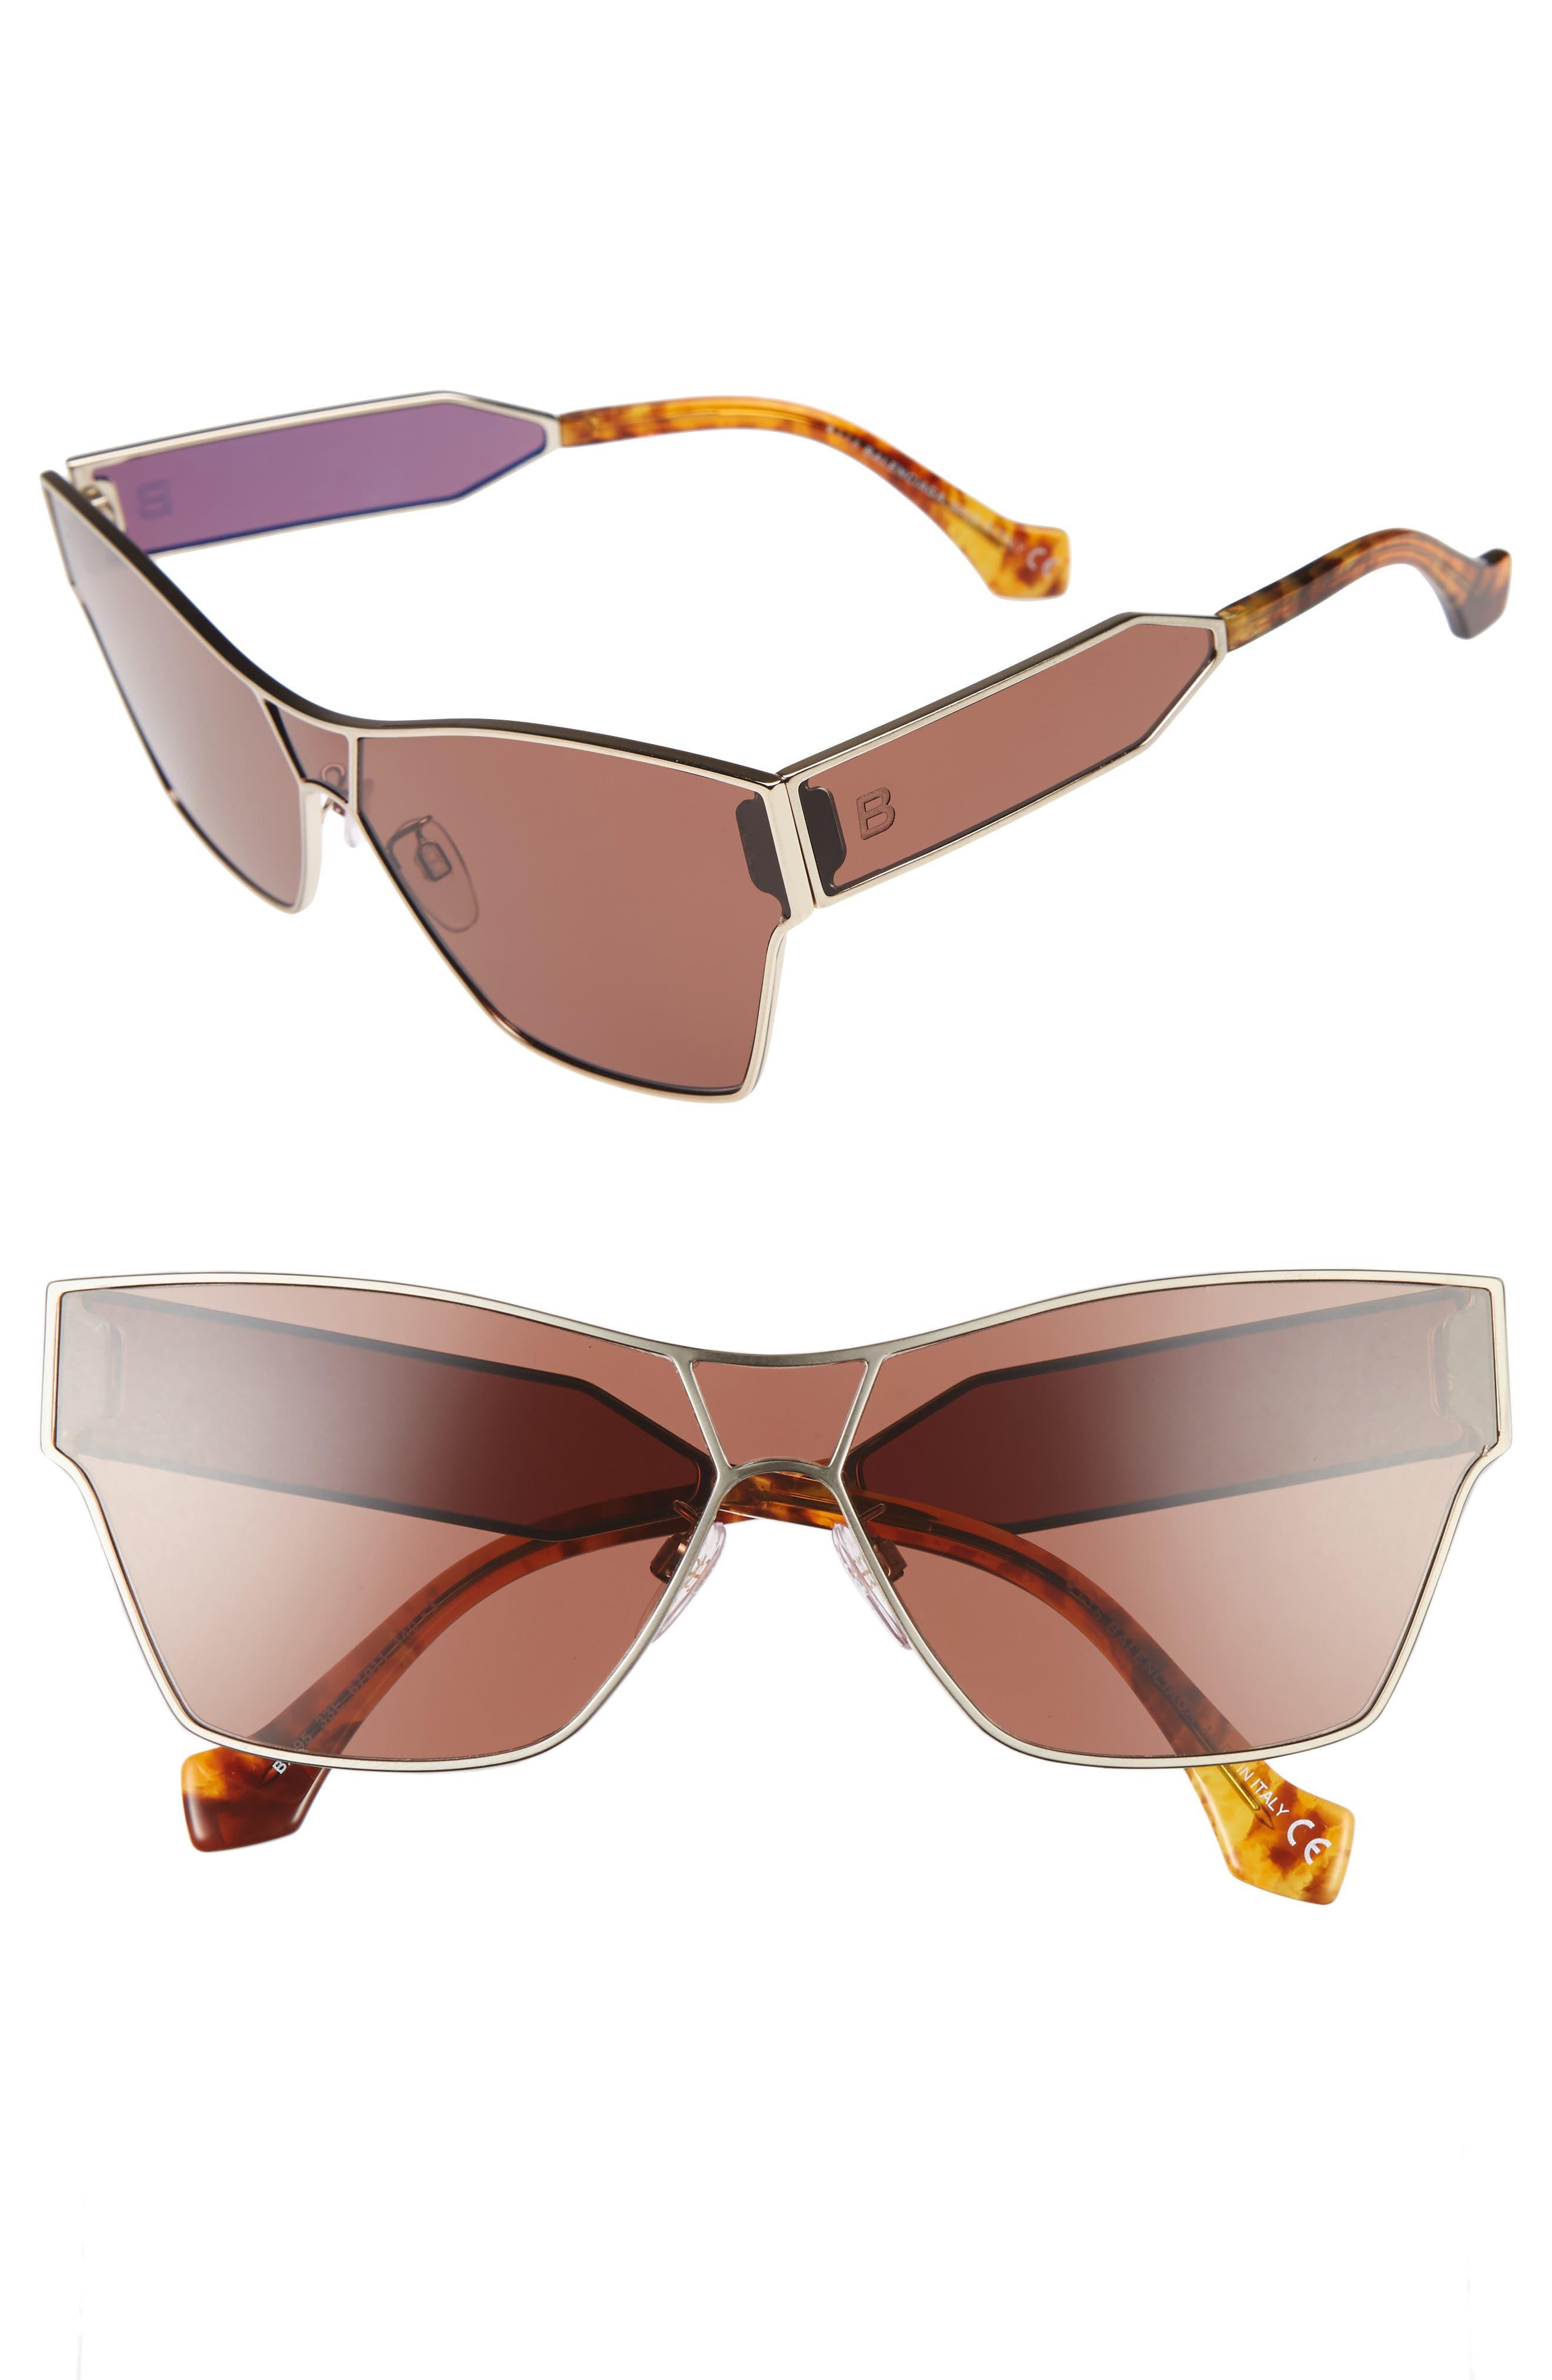 Balenciaga Paris 67mm Sunglasses